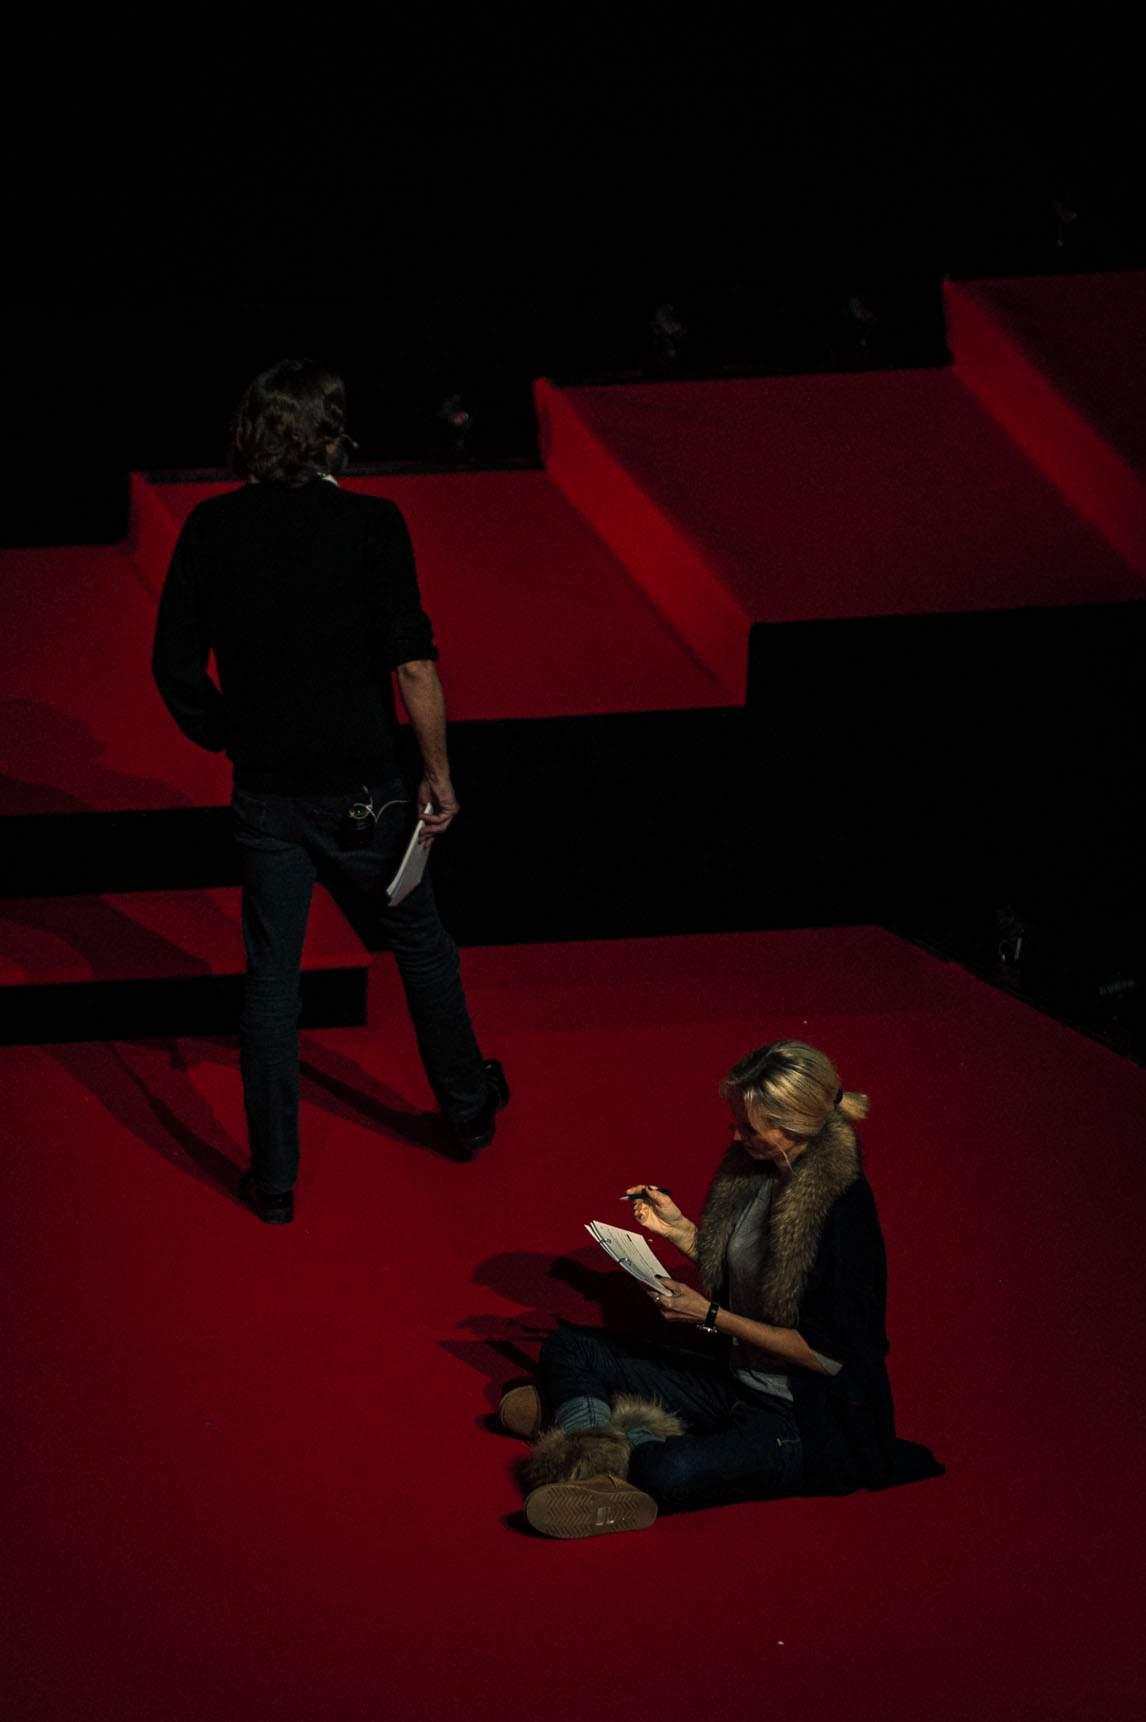 Frédéric Beigbeder and Adriana Karembeu (MCs of the prize-giving ceremony of the GPHG 2012)